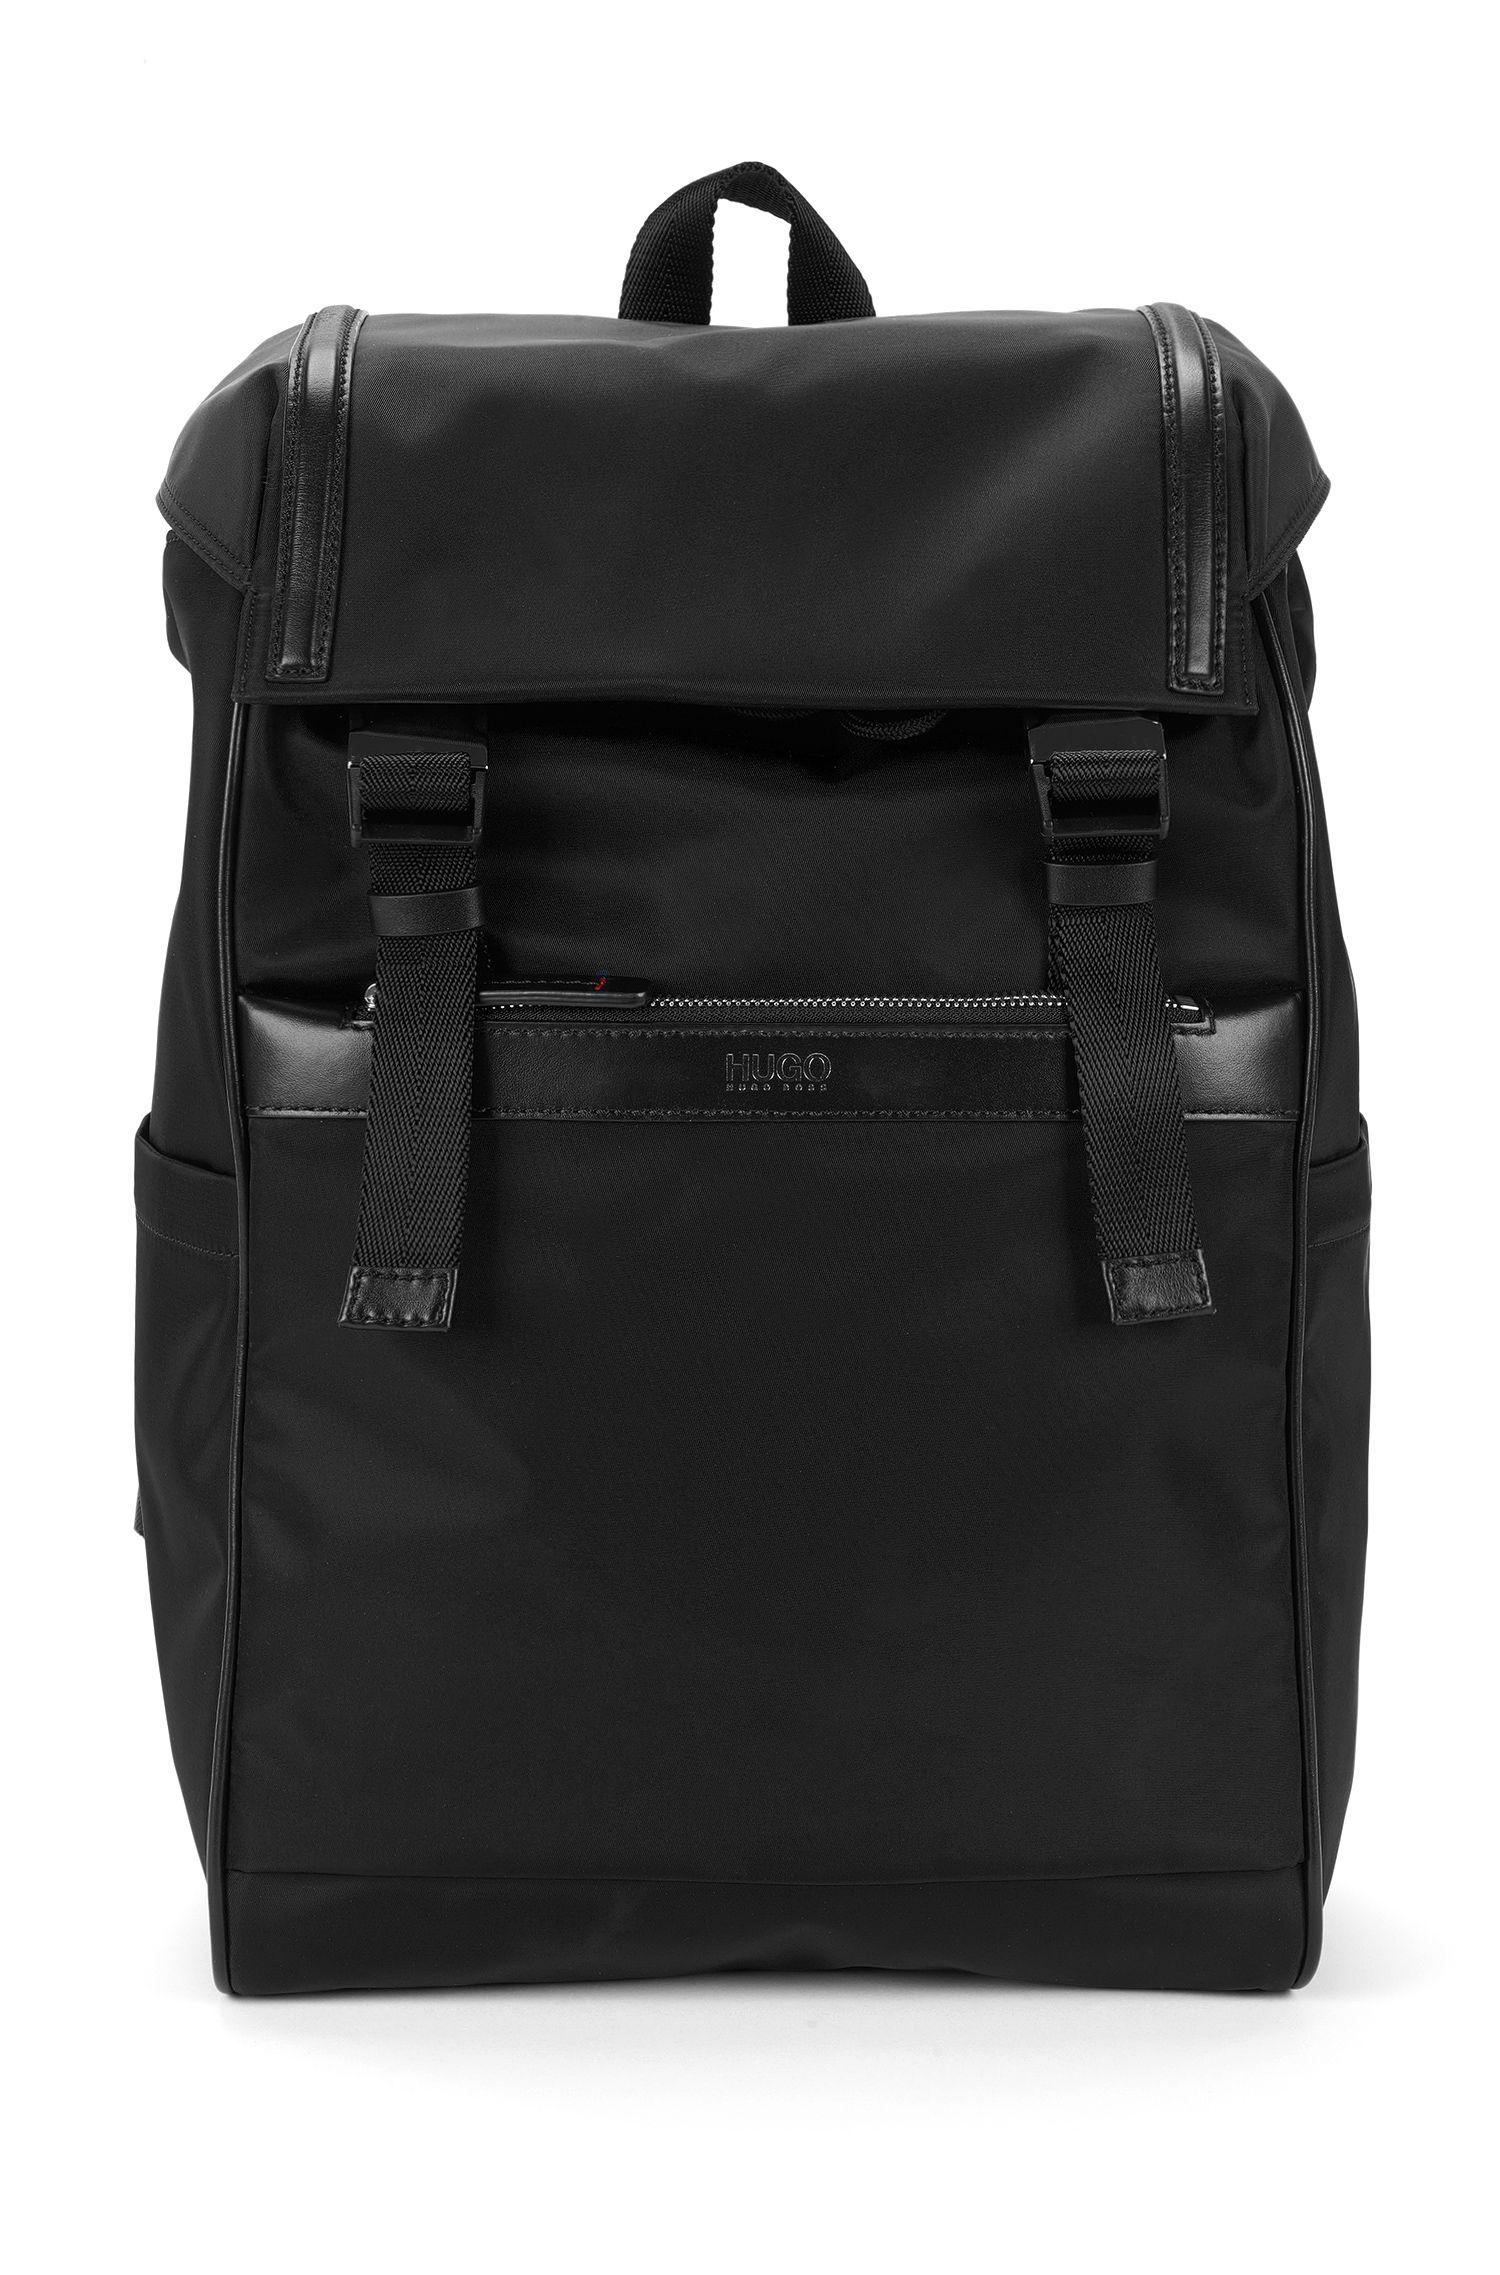 Rugzak met leren details: 'Digital L_Backpack'